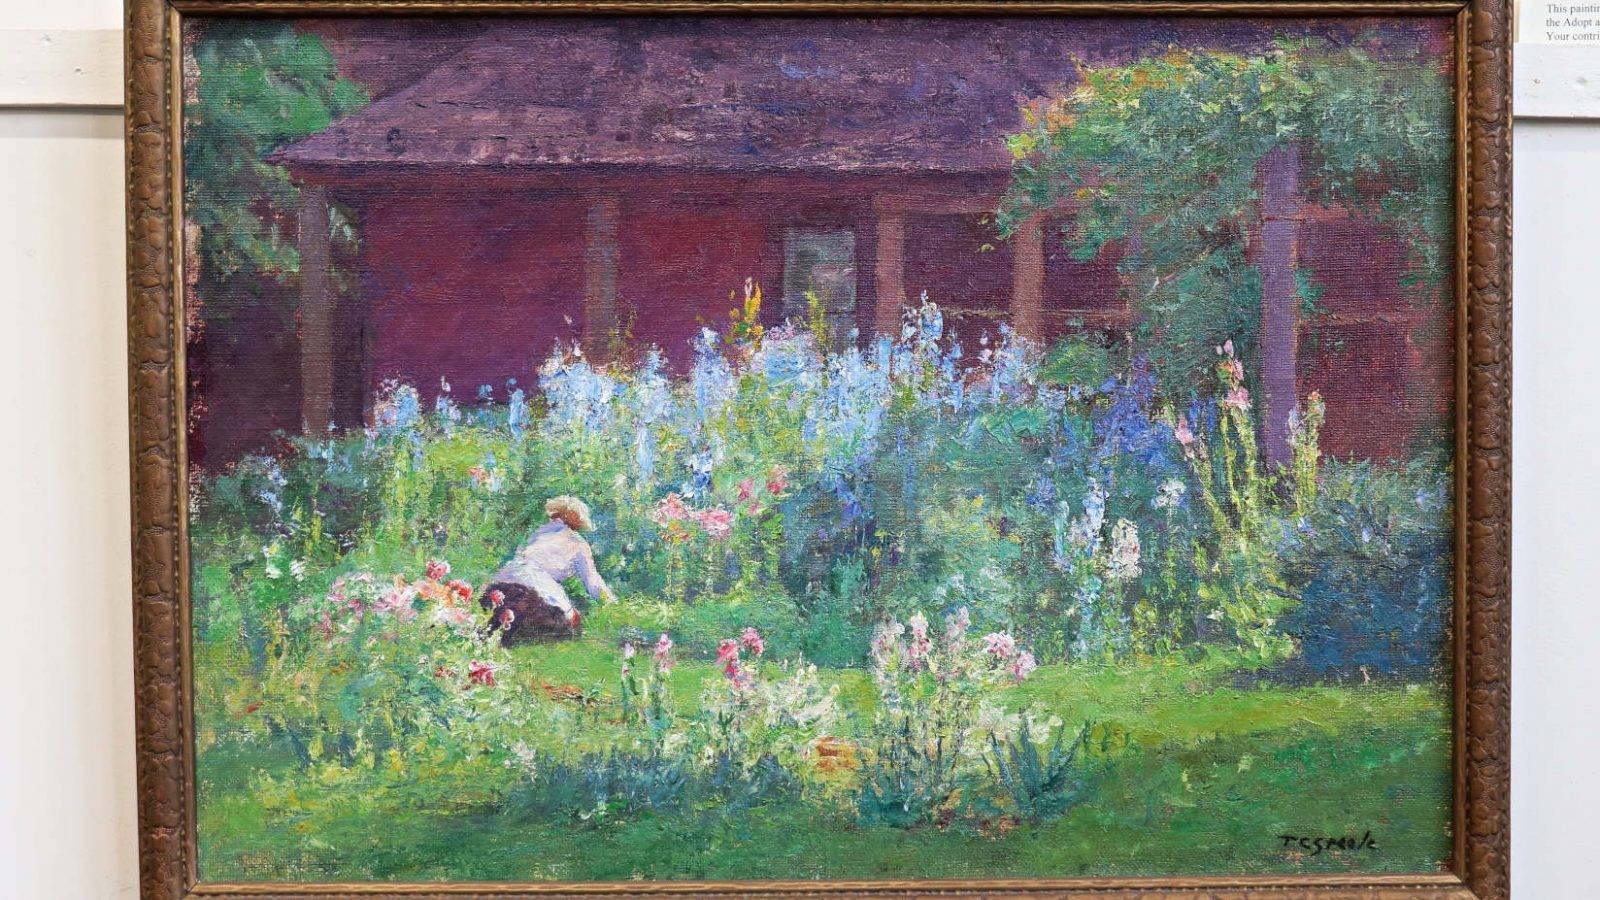 Selma in her garden depicted by T.C. Steele